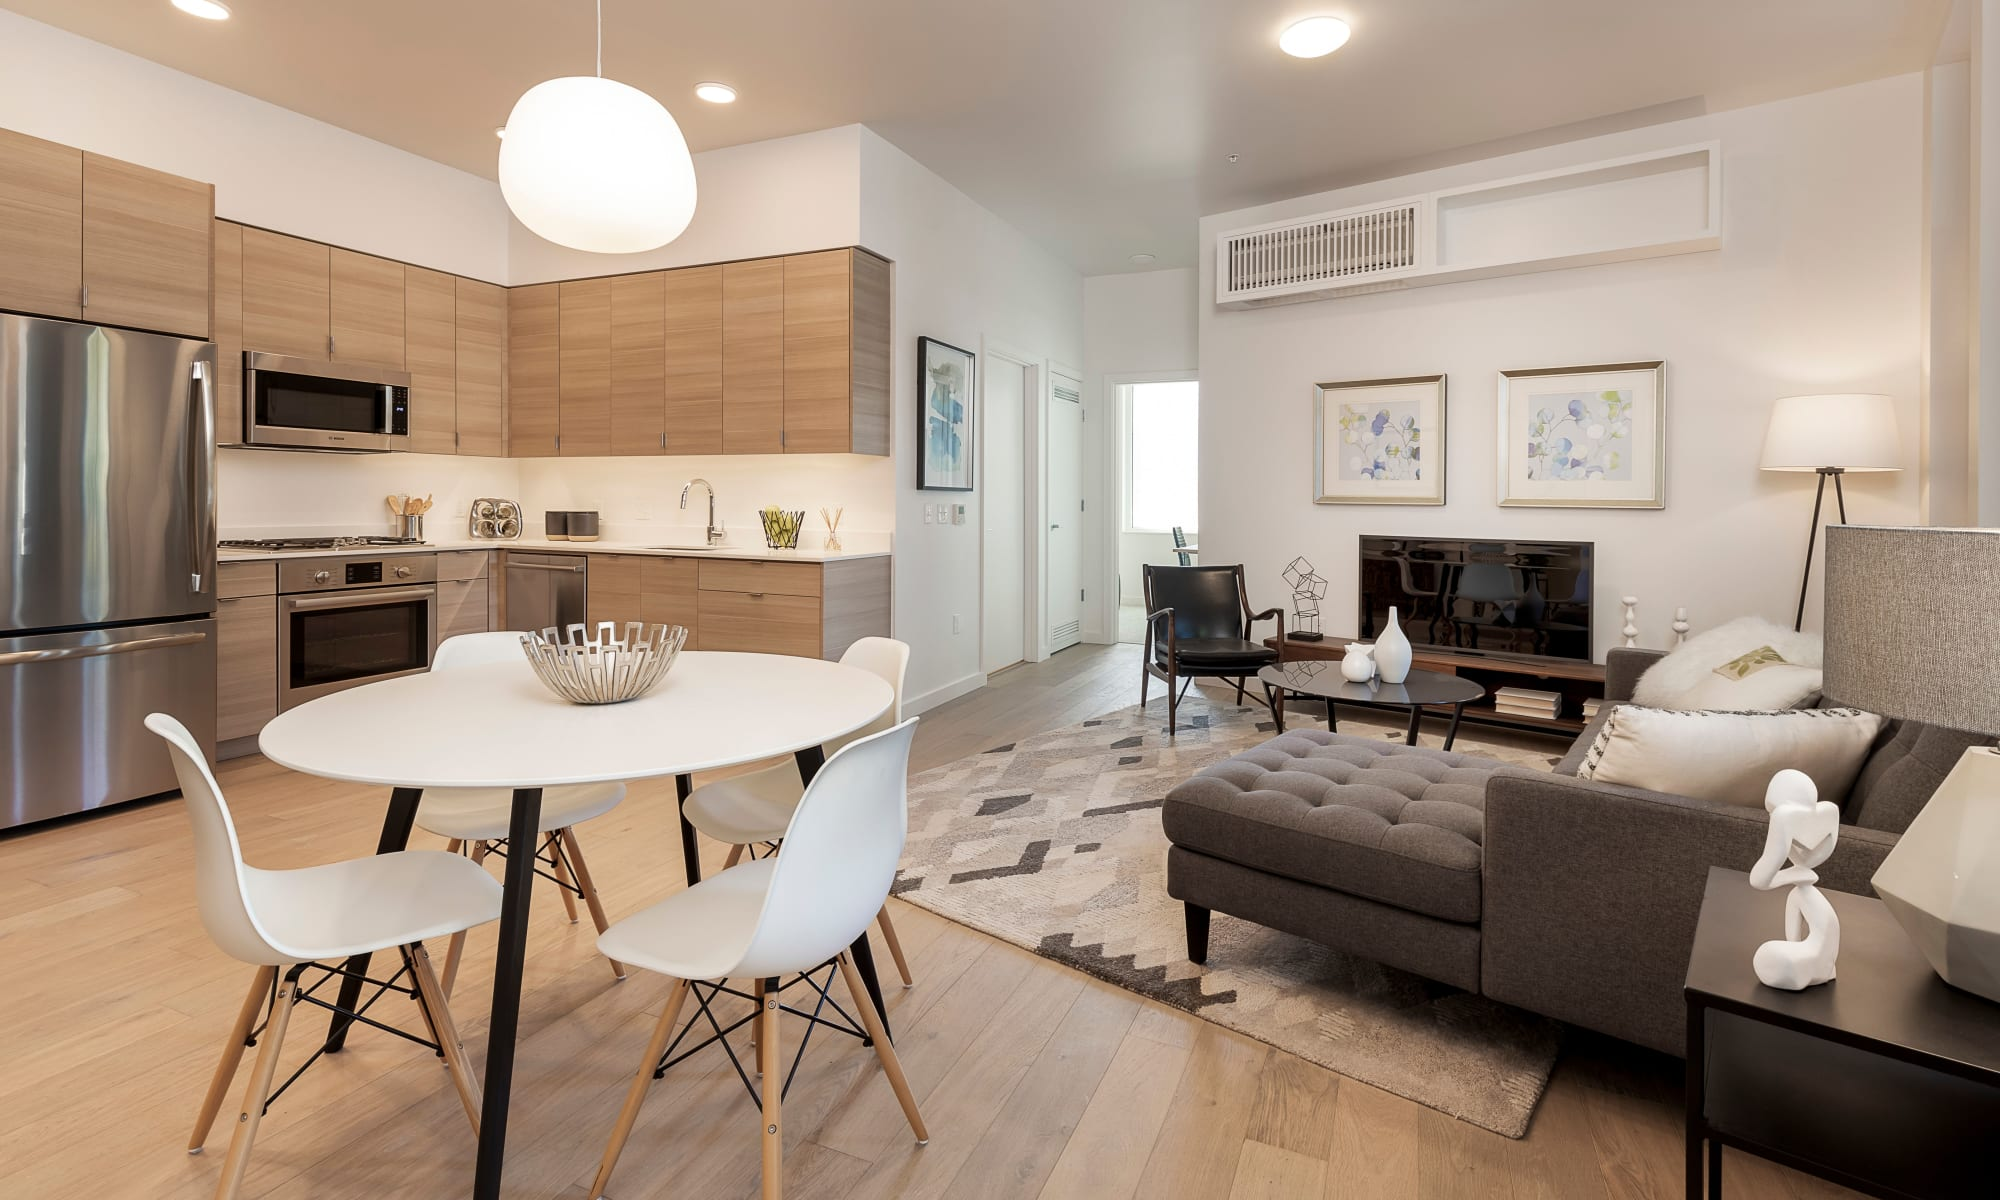 Apartments at TwentyTwenty Apartments in Portland, Oregon